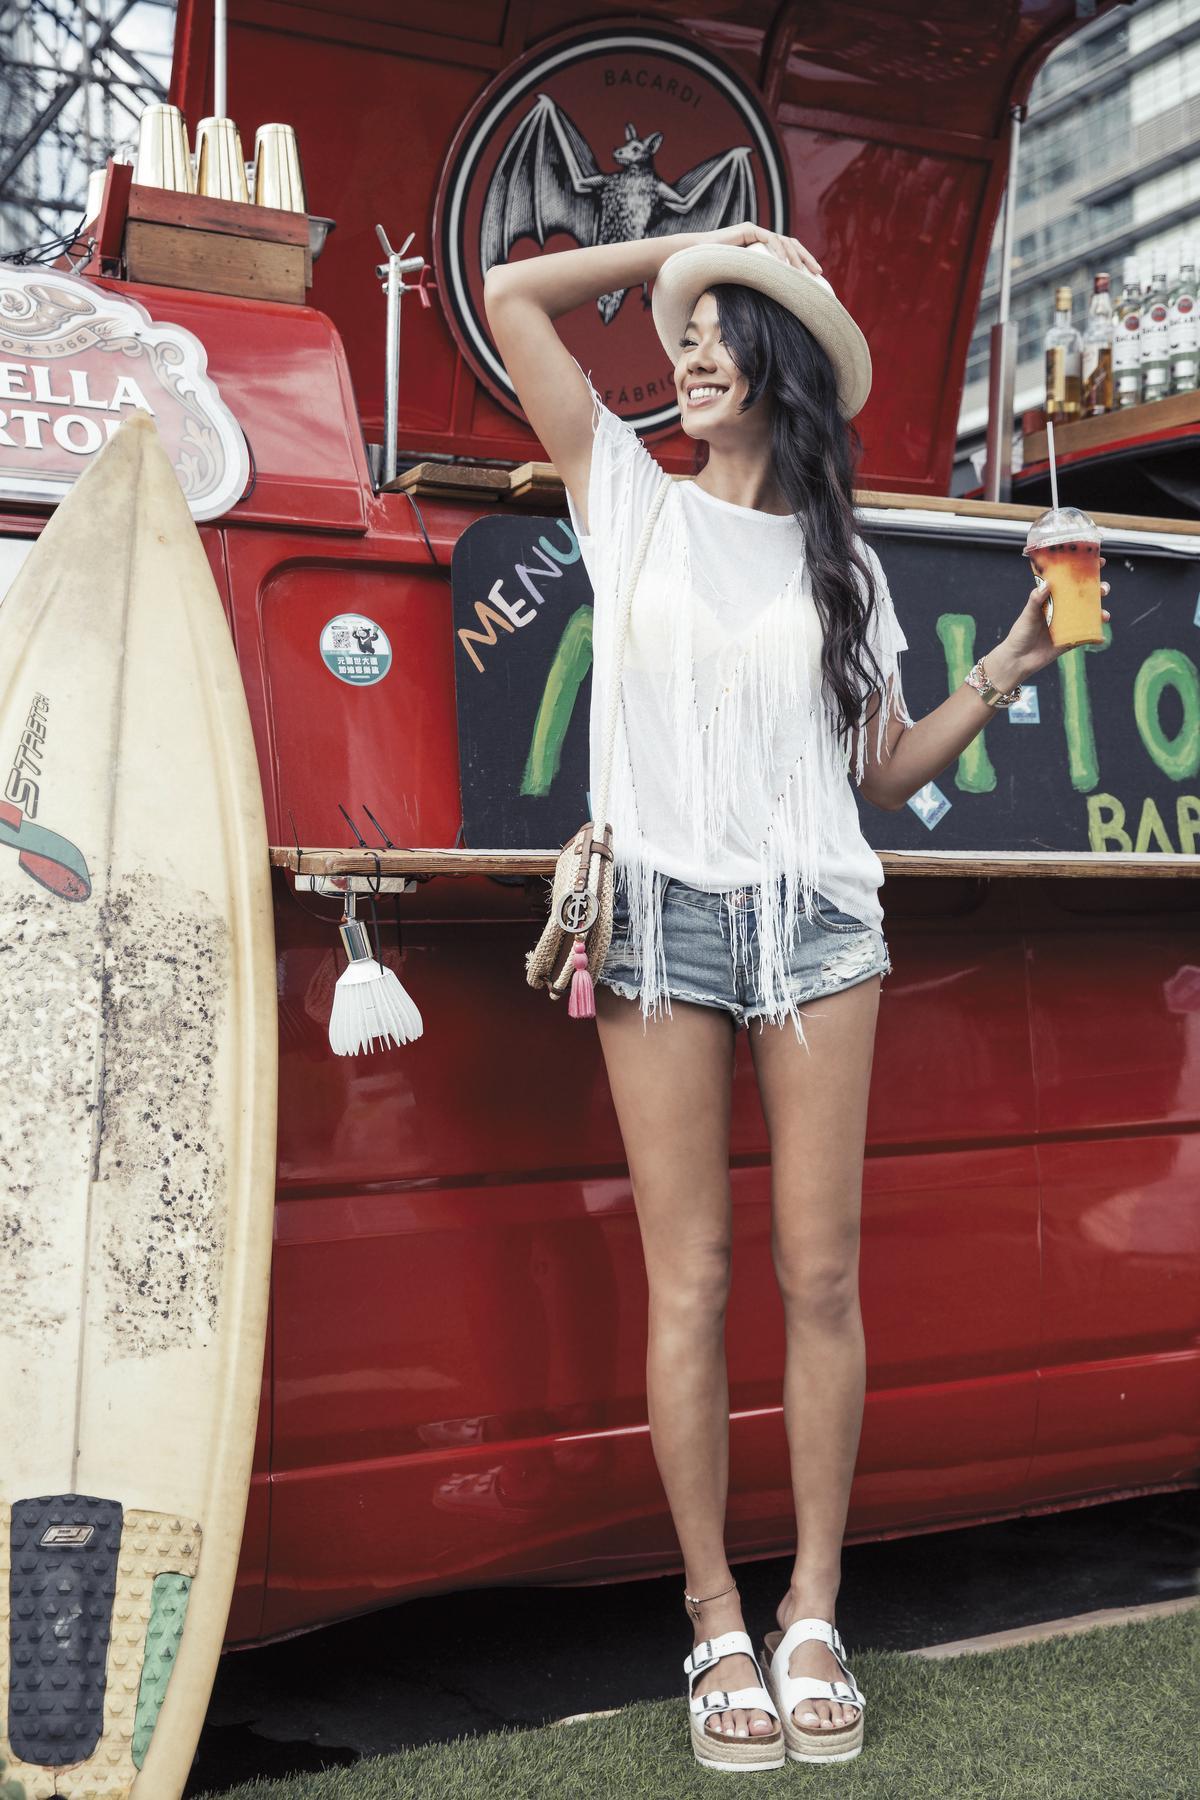 oda Swim黃色泳裝Bra。約NT$3,000 GEGINA白色罩衫。廠商贈送 ONE X ONETEASPOON丹寧短褲。約NT$3,000 Jeffrey Campbell白色拖鞋。約NT$3,600 Lucy's耳環。廠商贈送